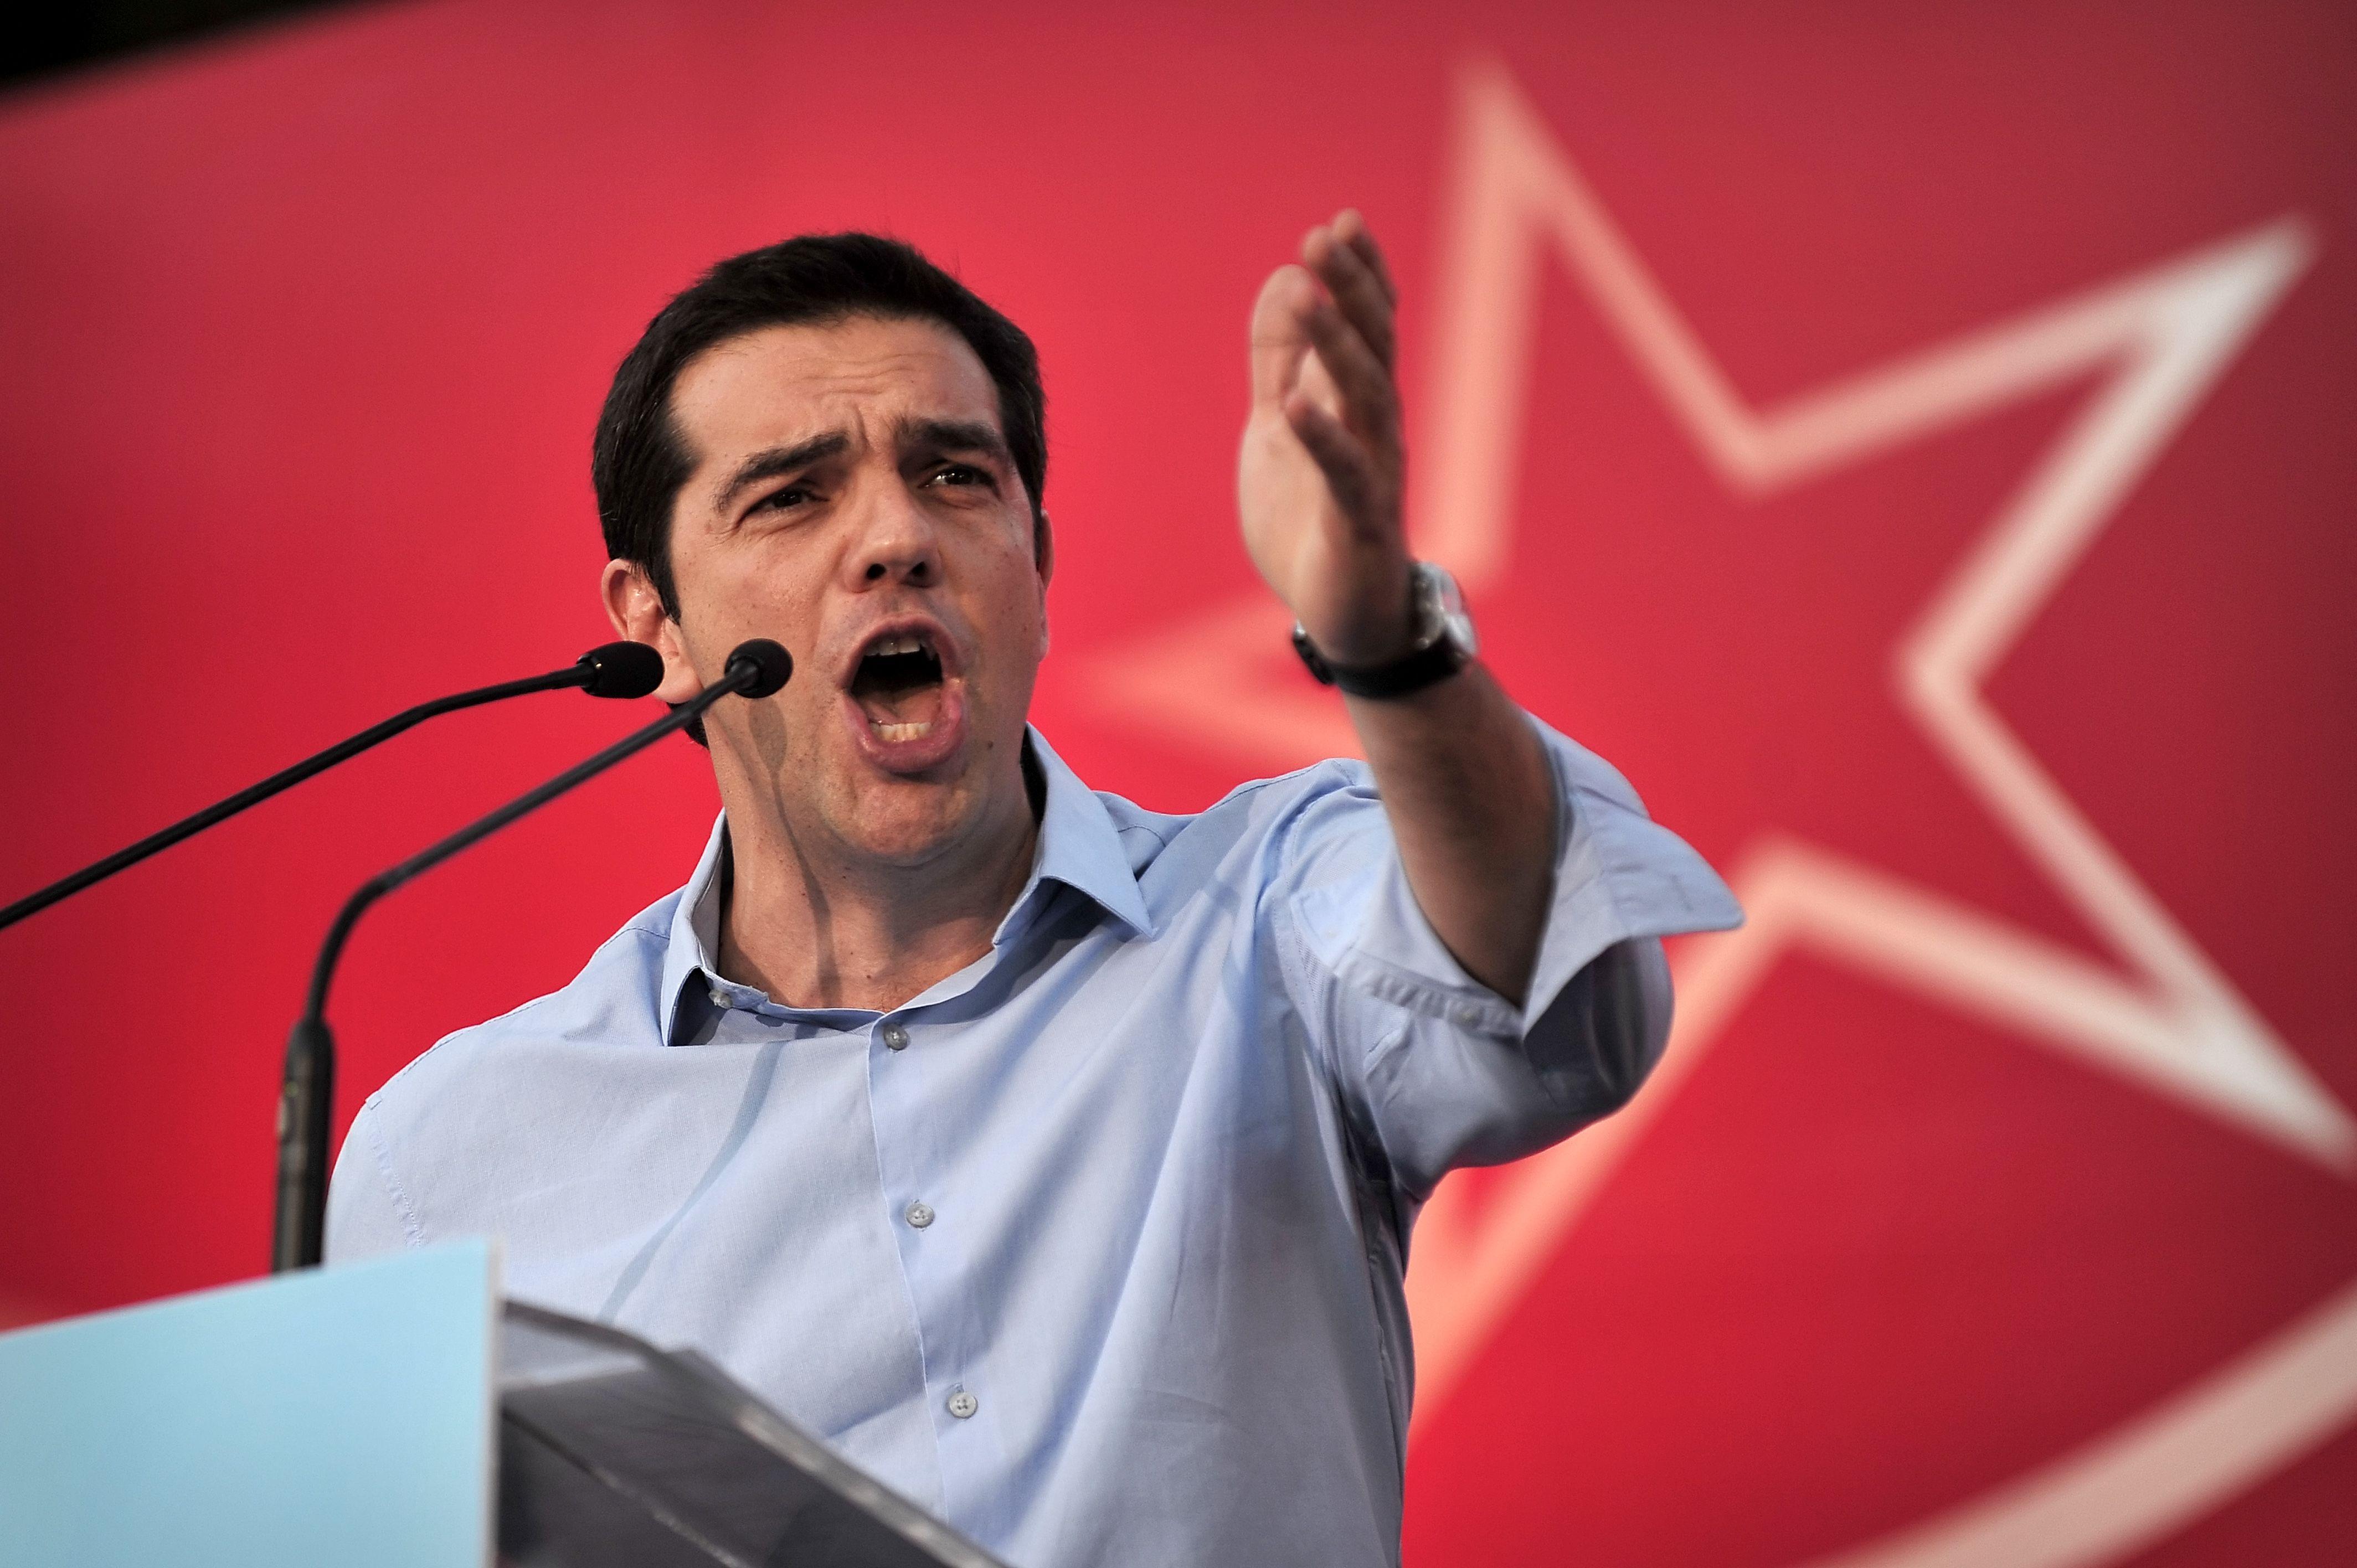 e-ardhmja-e-pasigurt-e-greqise-nen-qeverine-e-saj-te-re